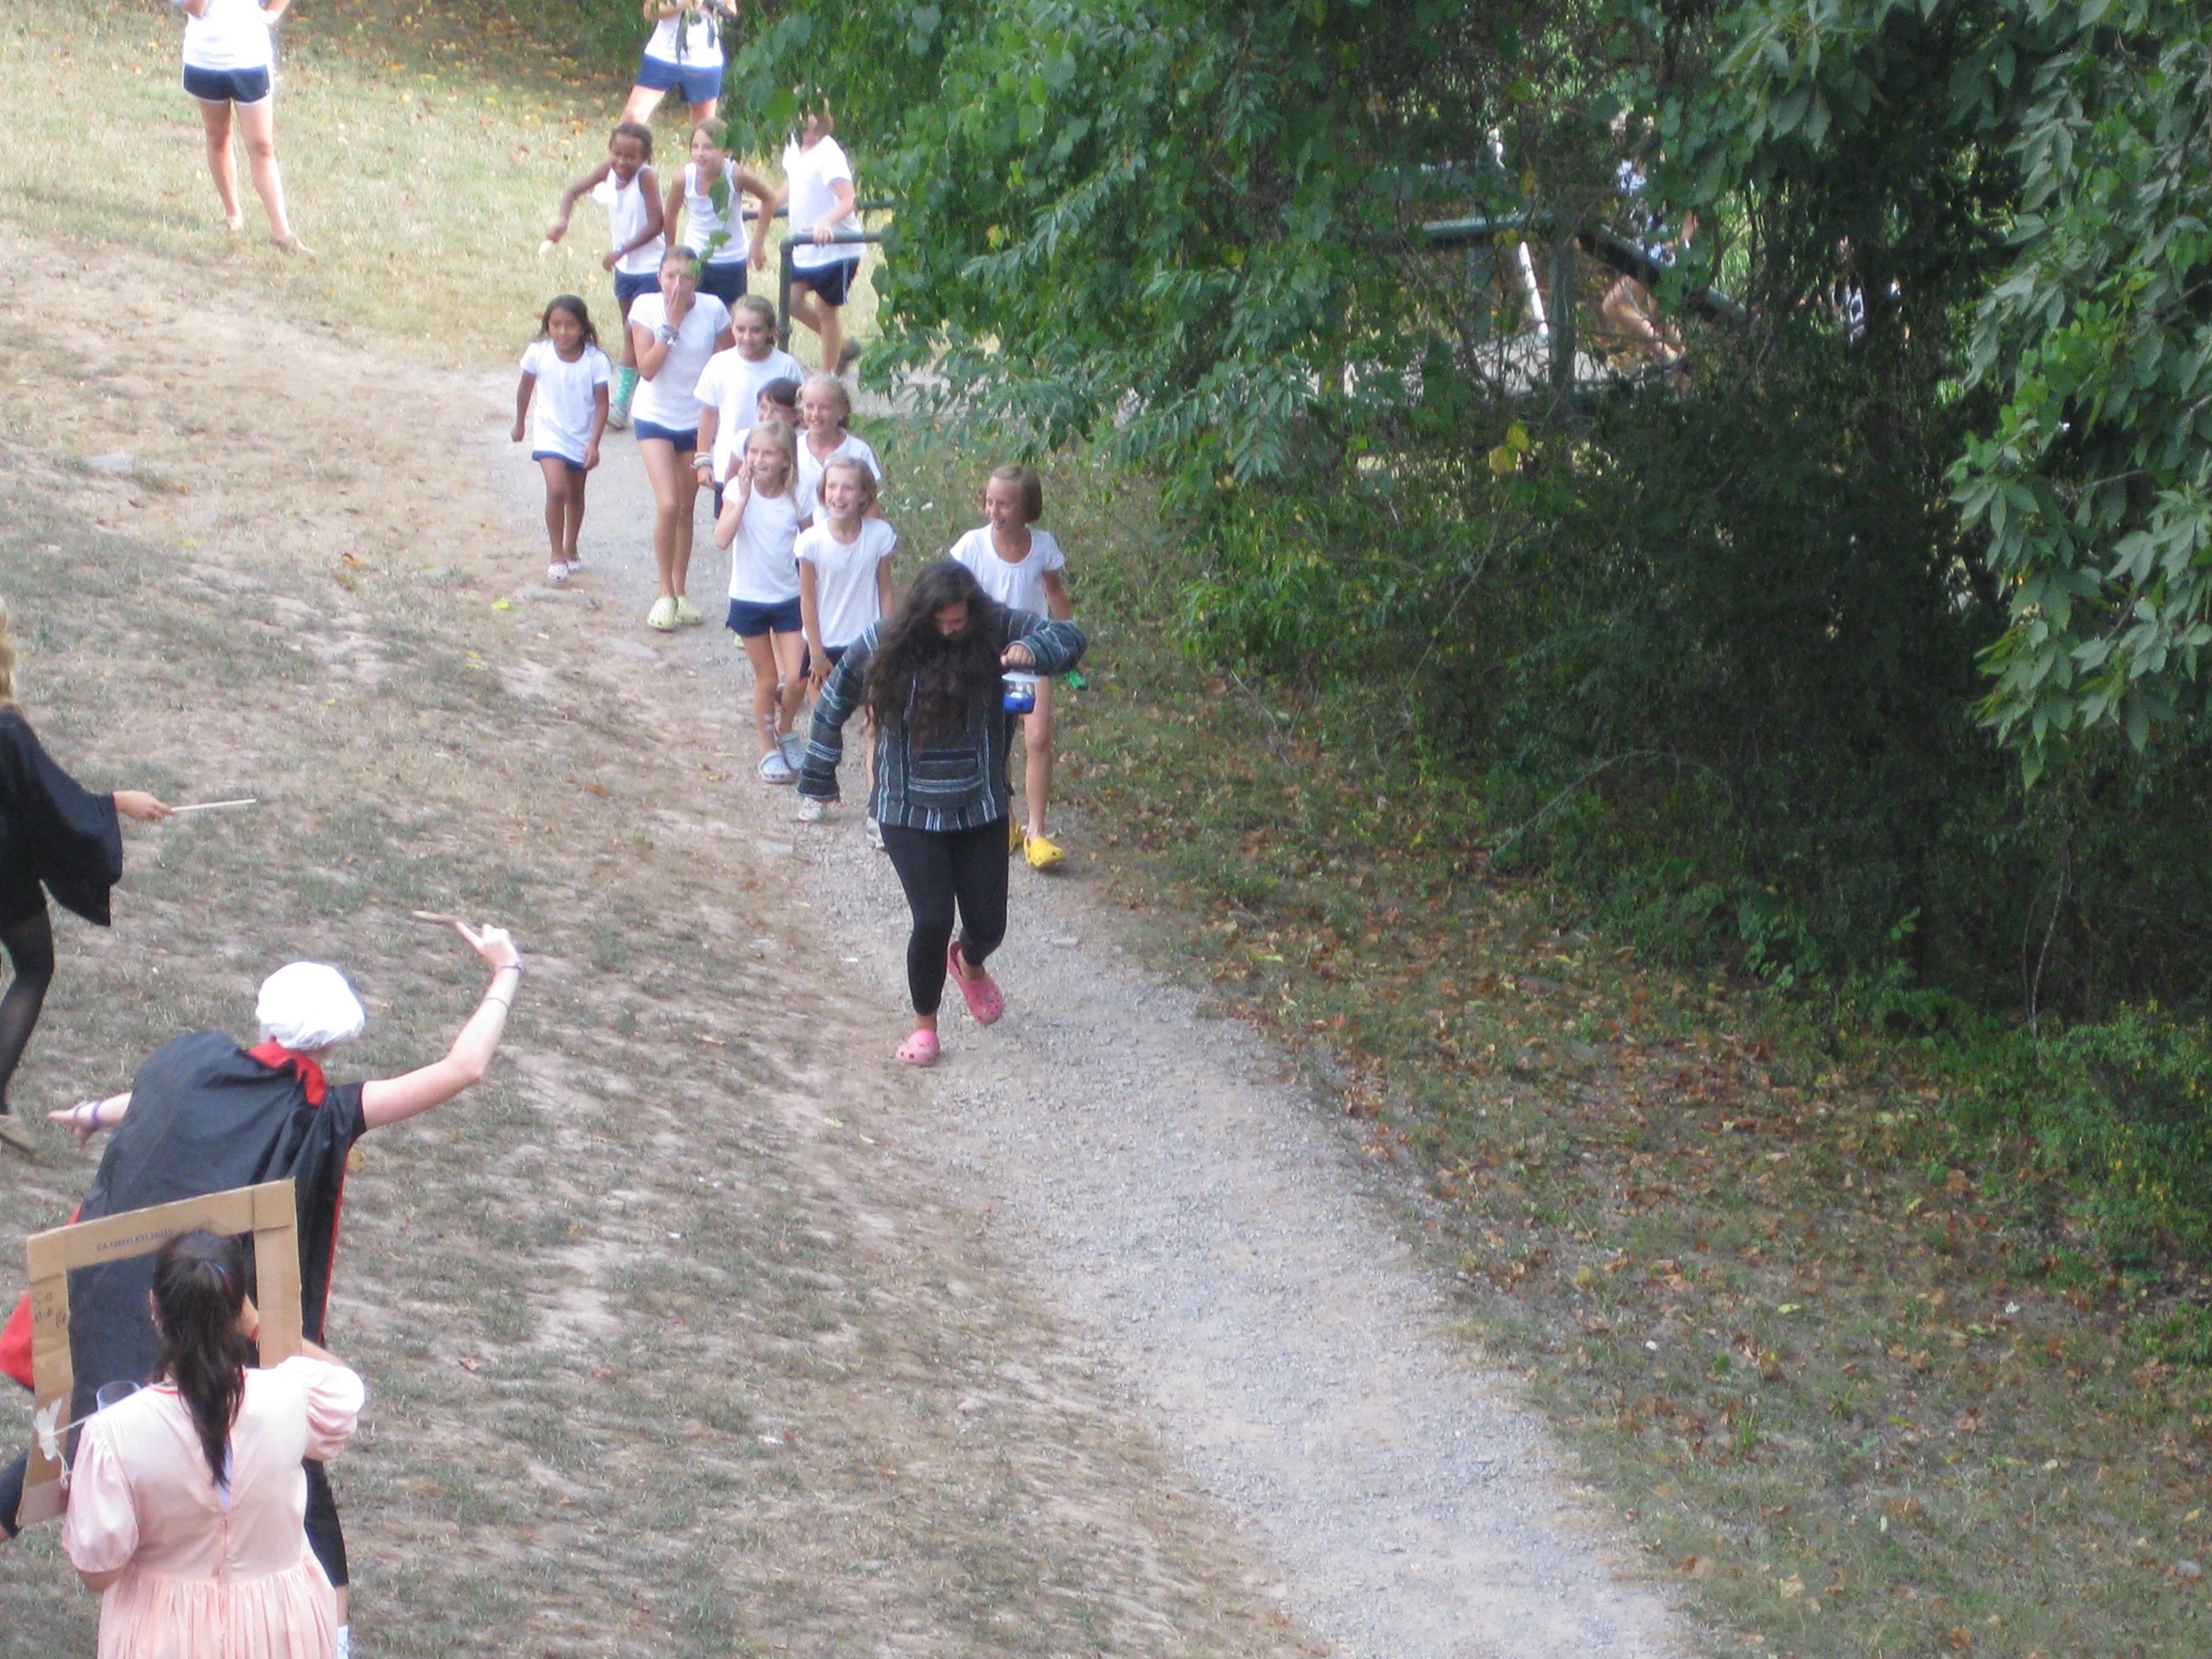 hagrid leading campers